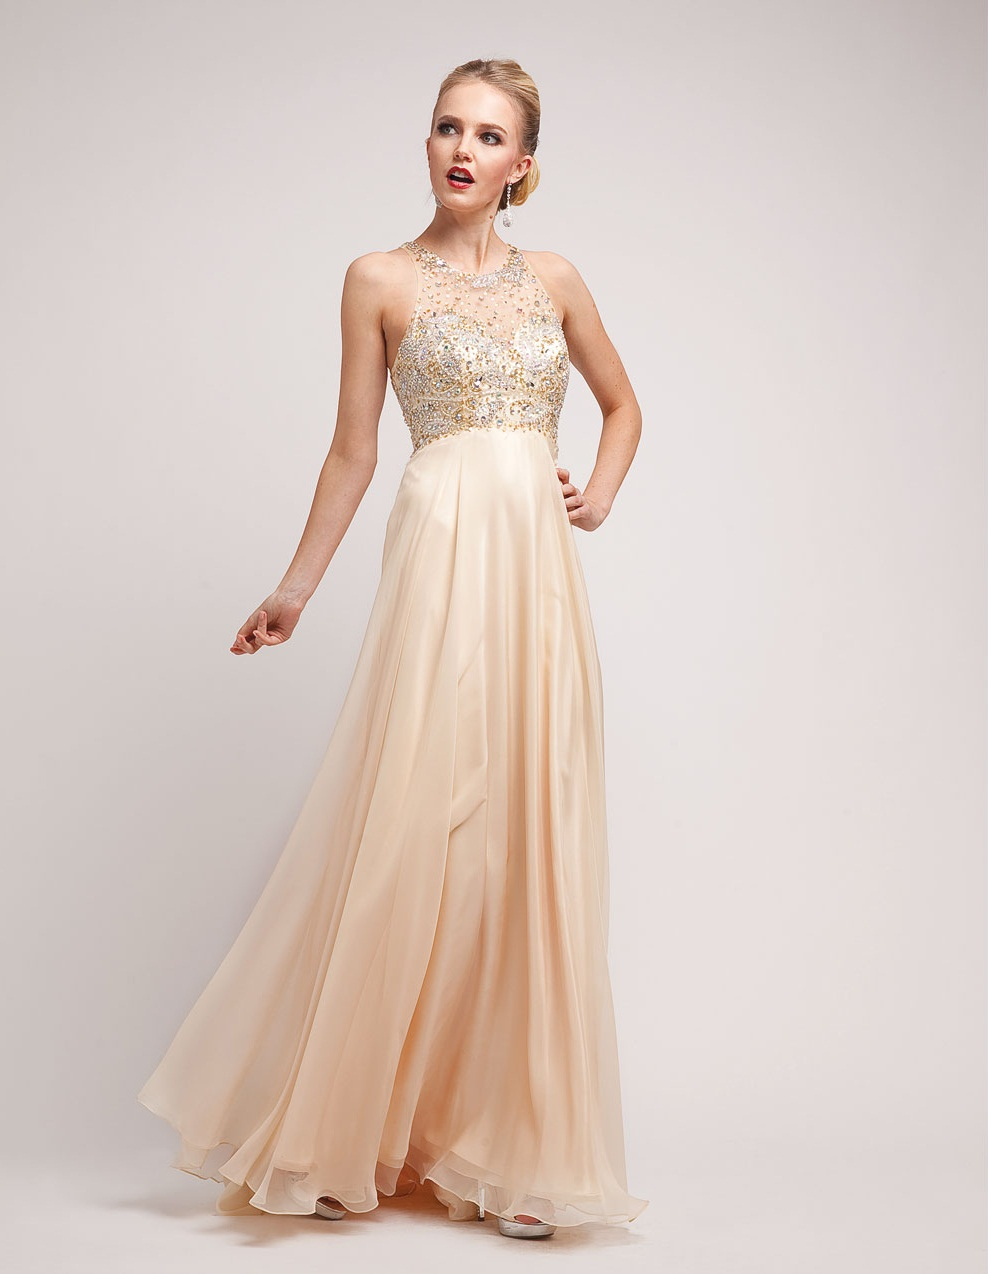 Champagne Prom Dresses Dressedup